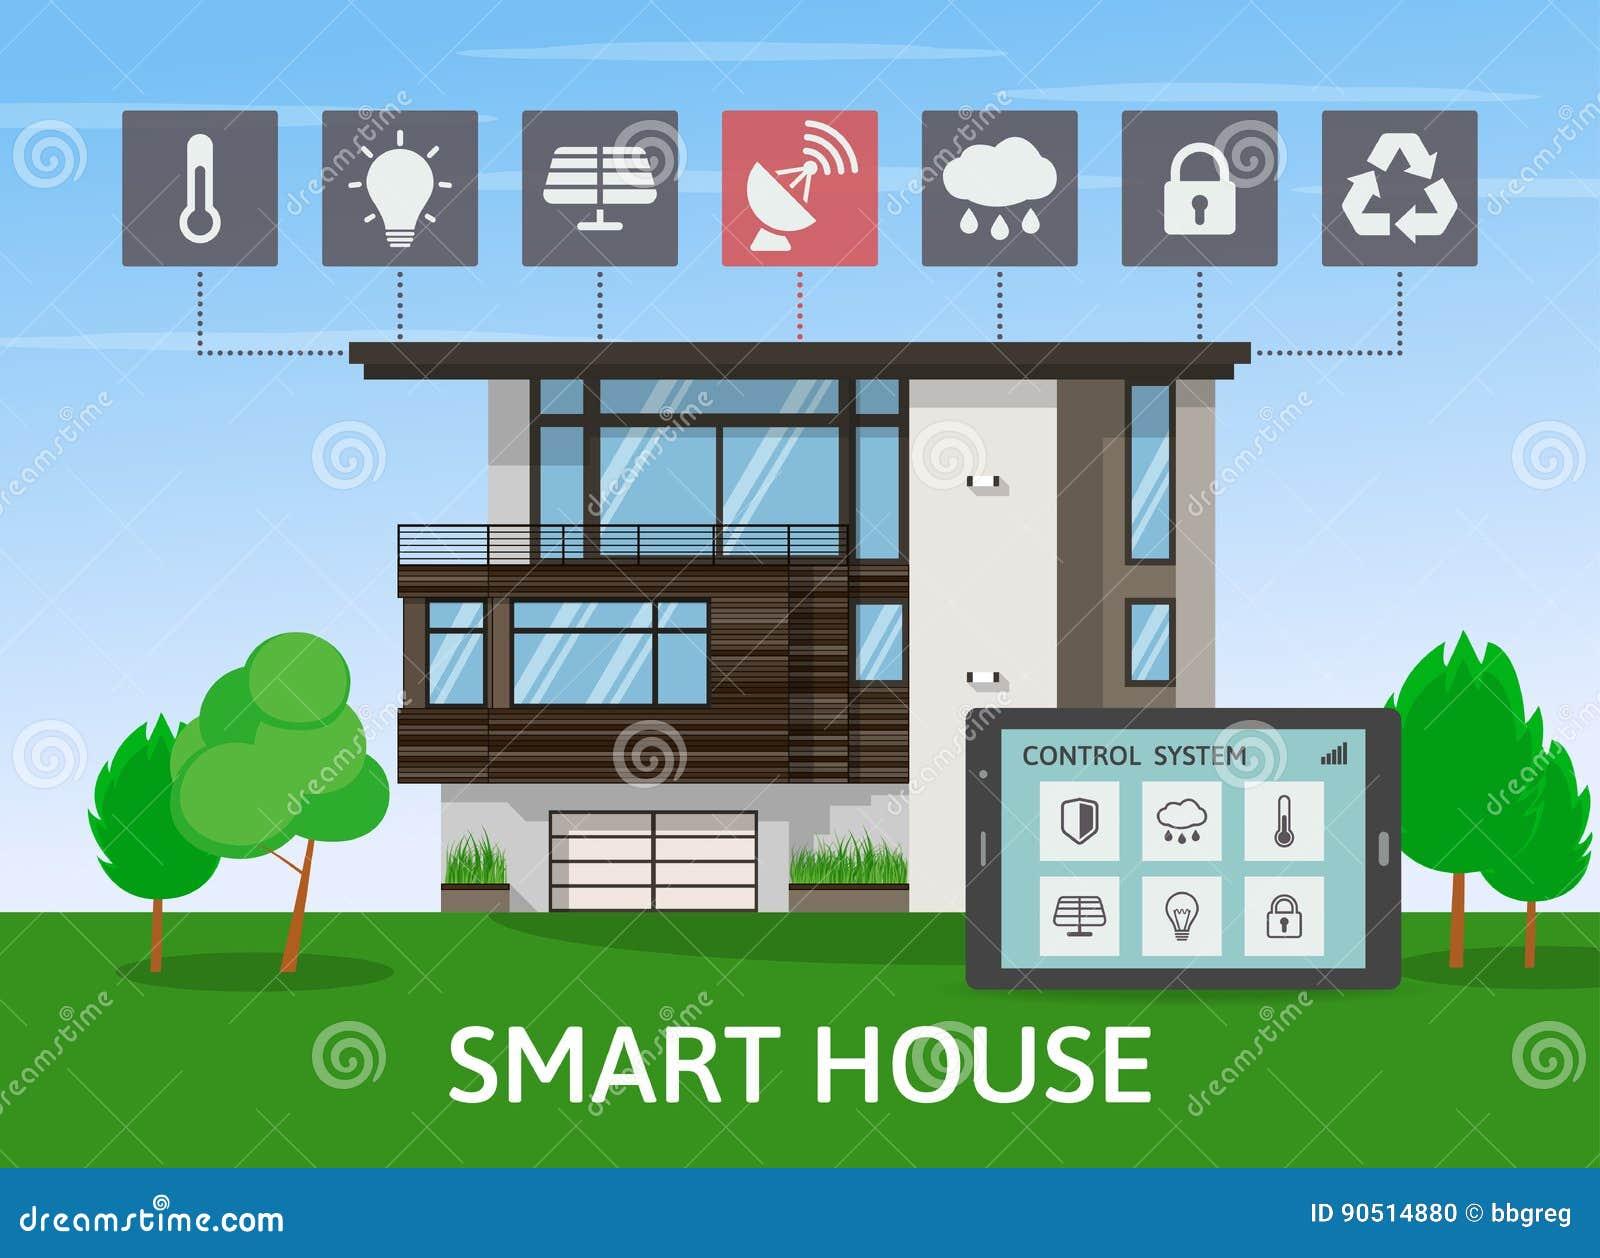 Solar cartoons illustrations vector stock images for Modern house technology